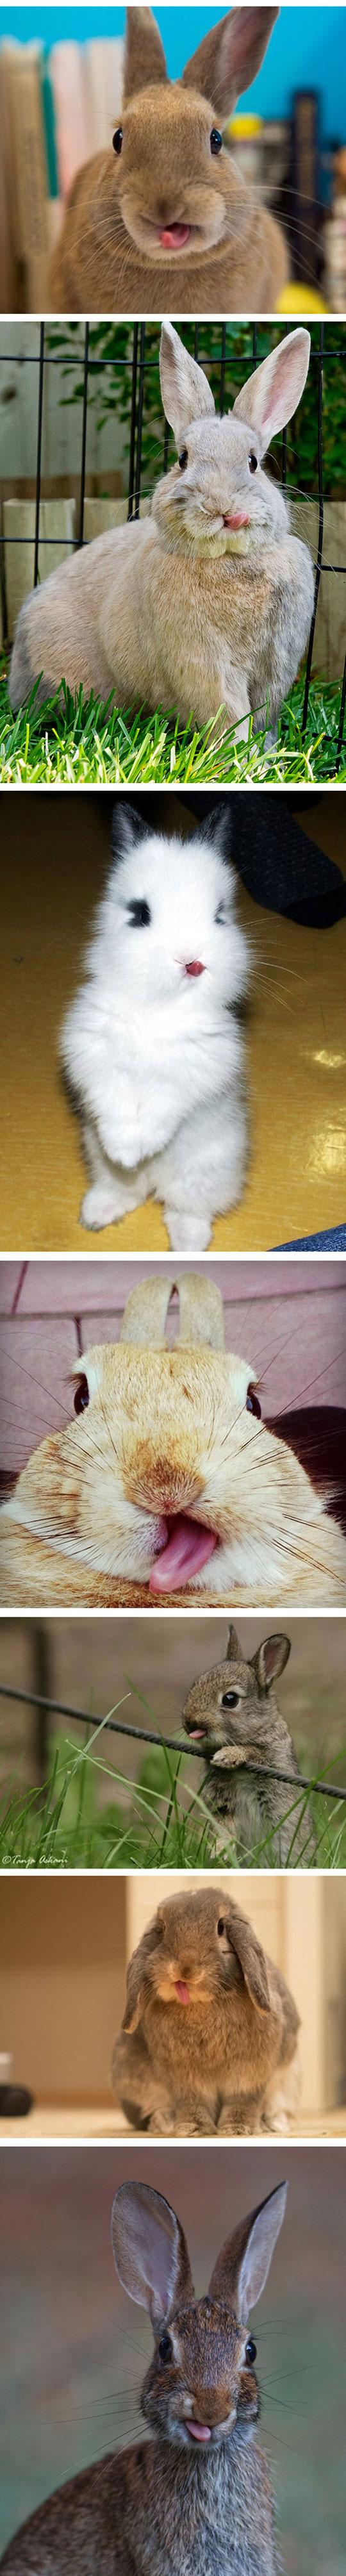 funny-cute-rabbits-tongue-out